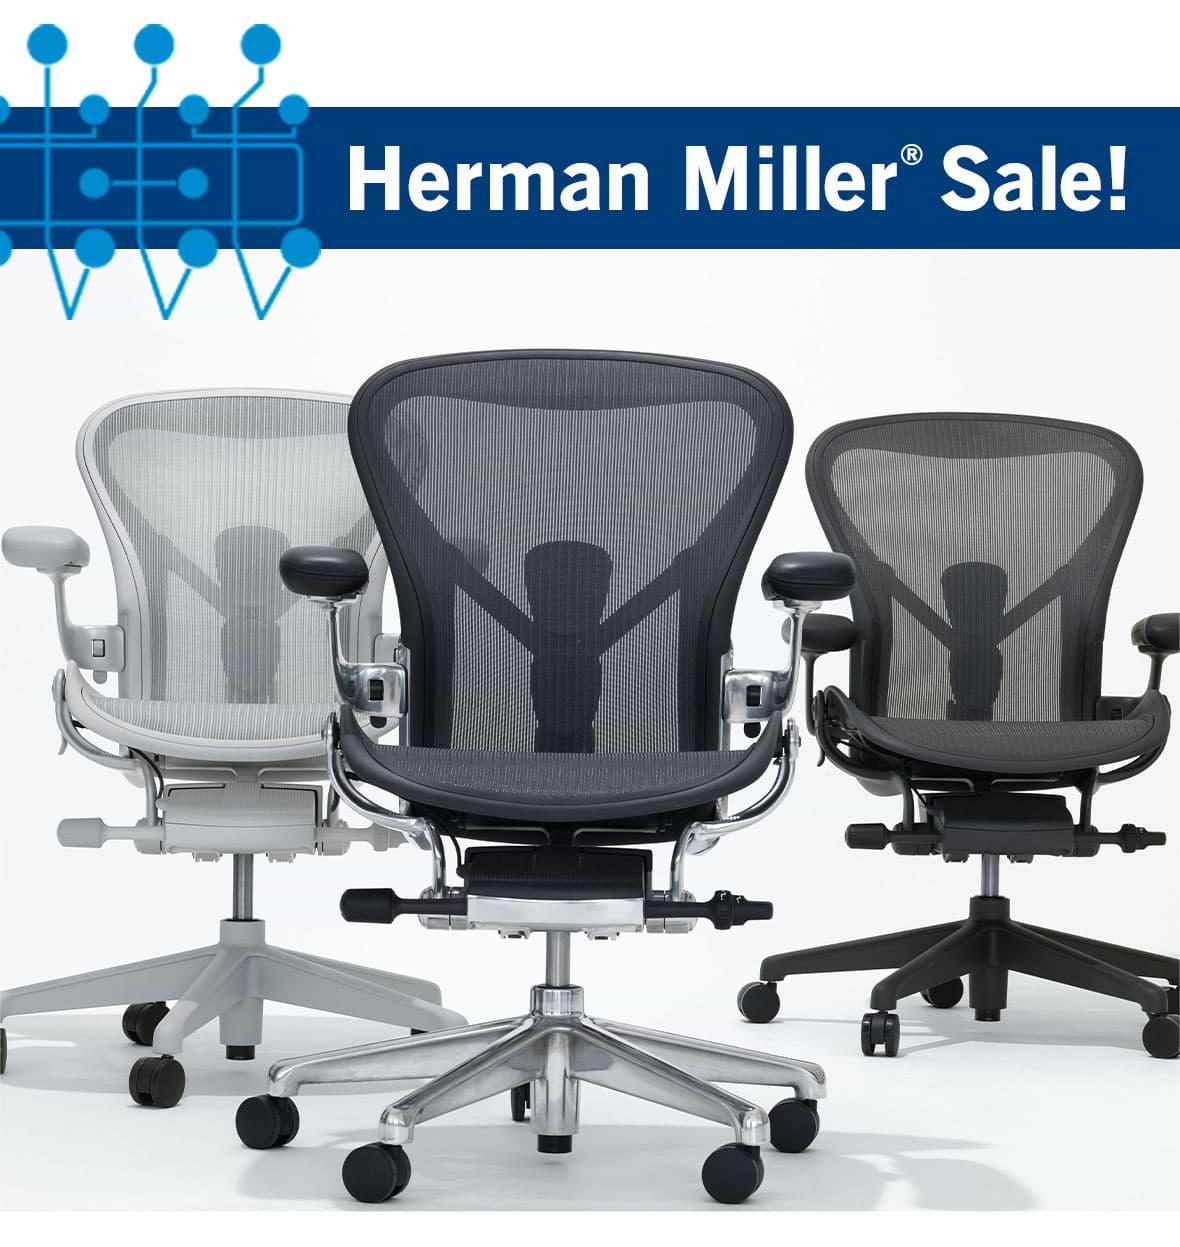 Herman Miller® Sale!